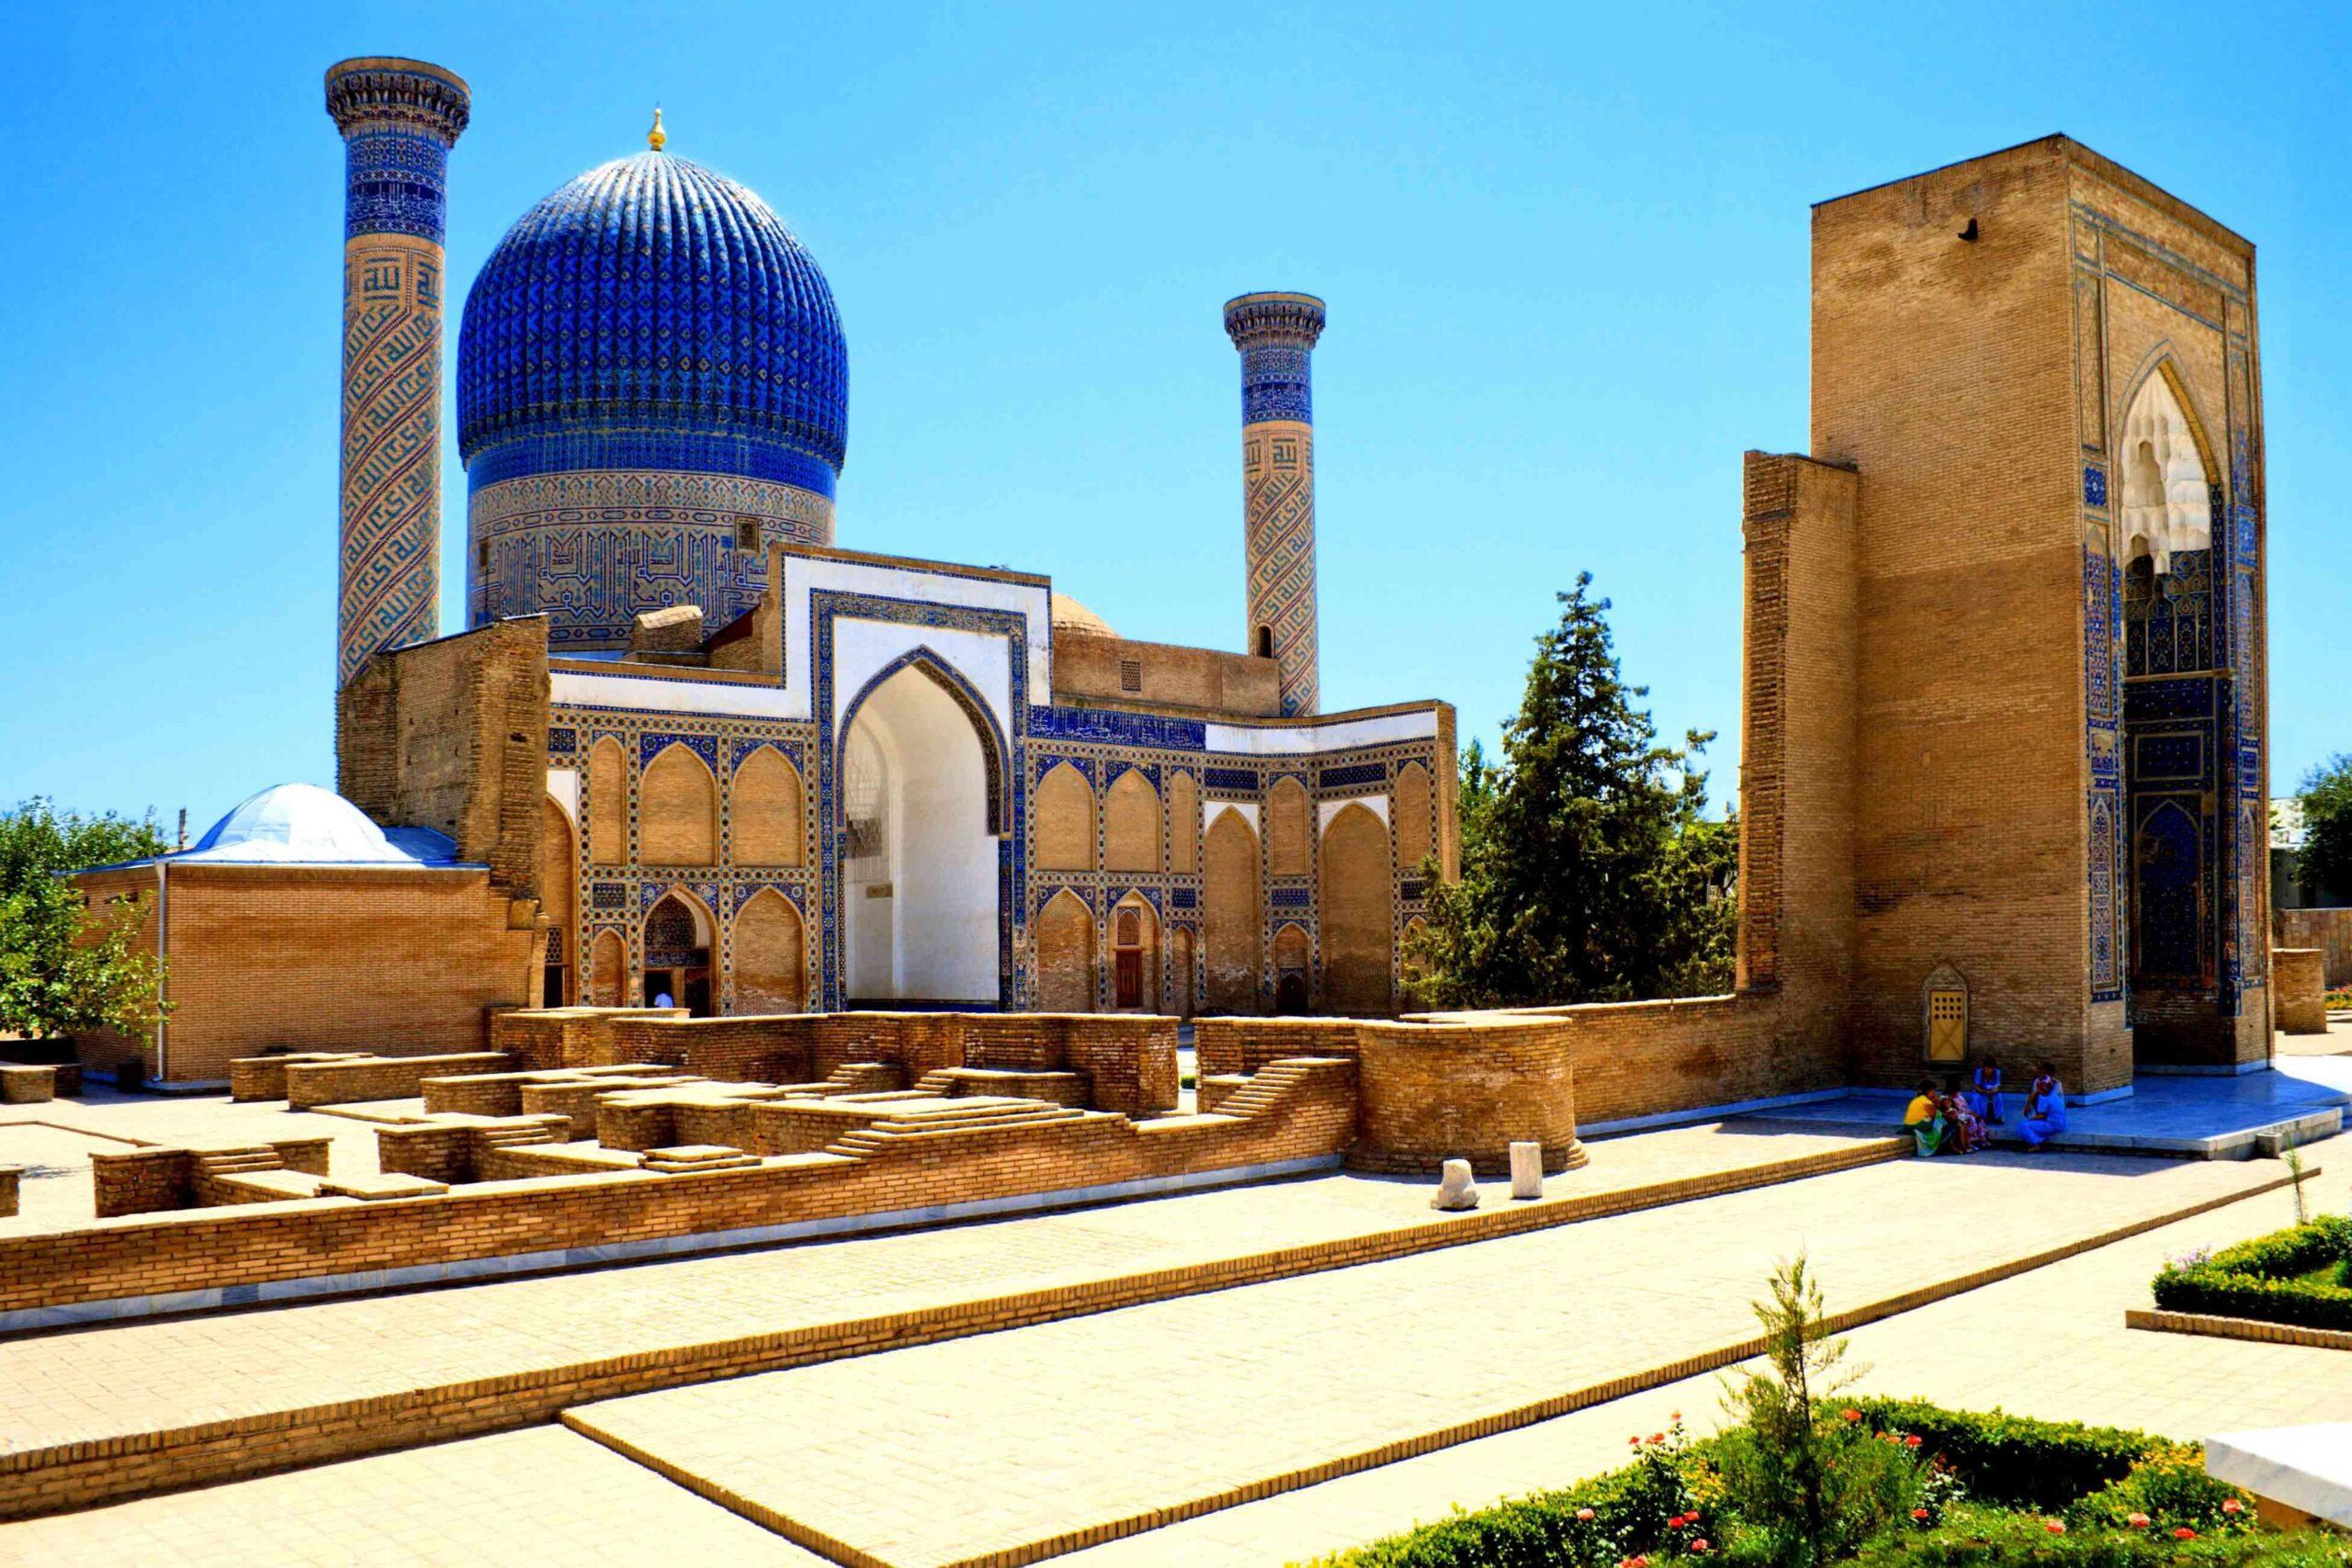 UZBEKISTAN (TASHKANT + SAMARKAND) Holiday Travel & Tour Package